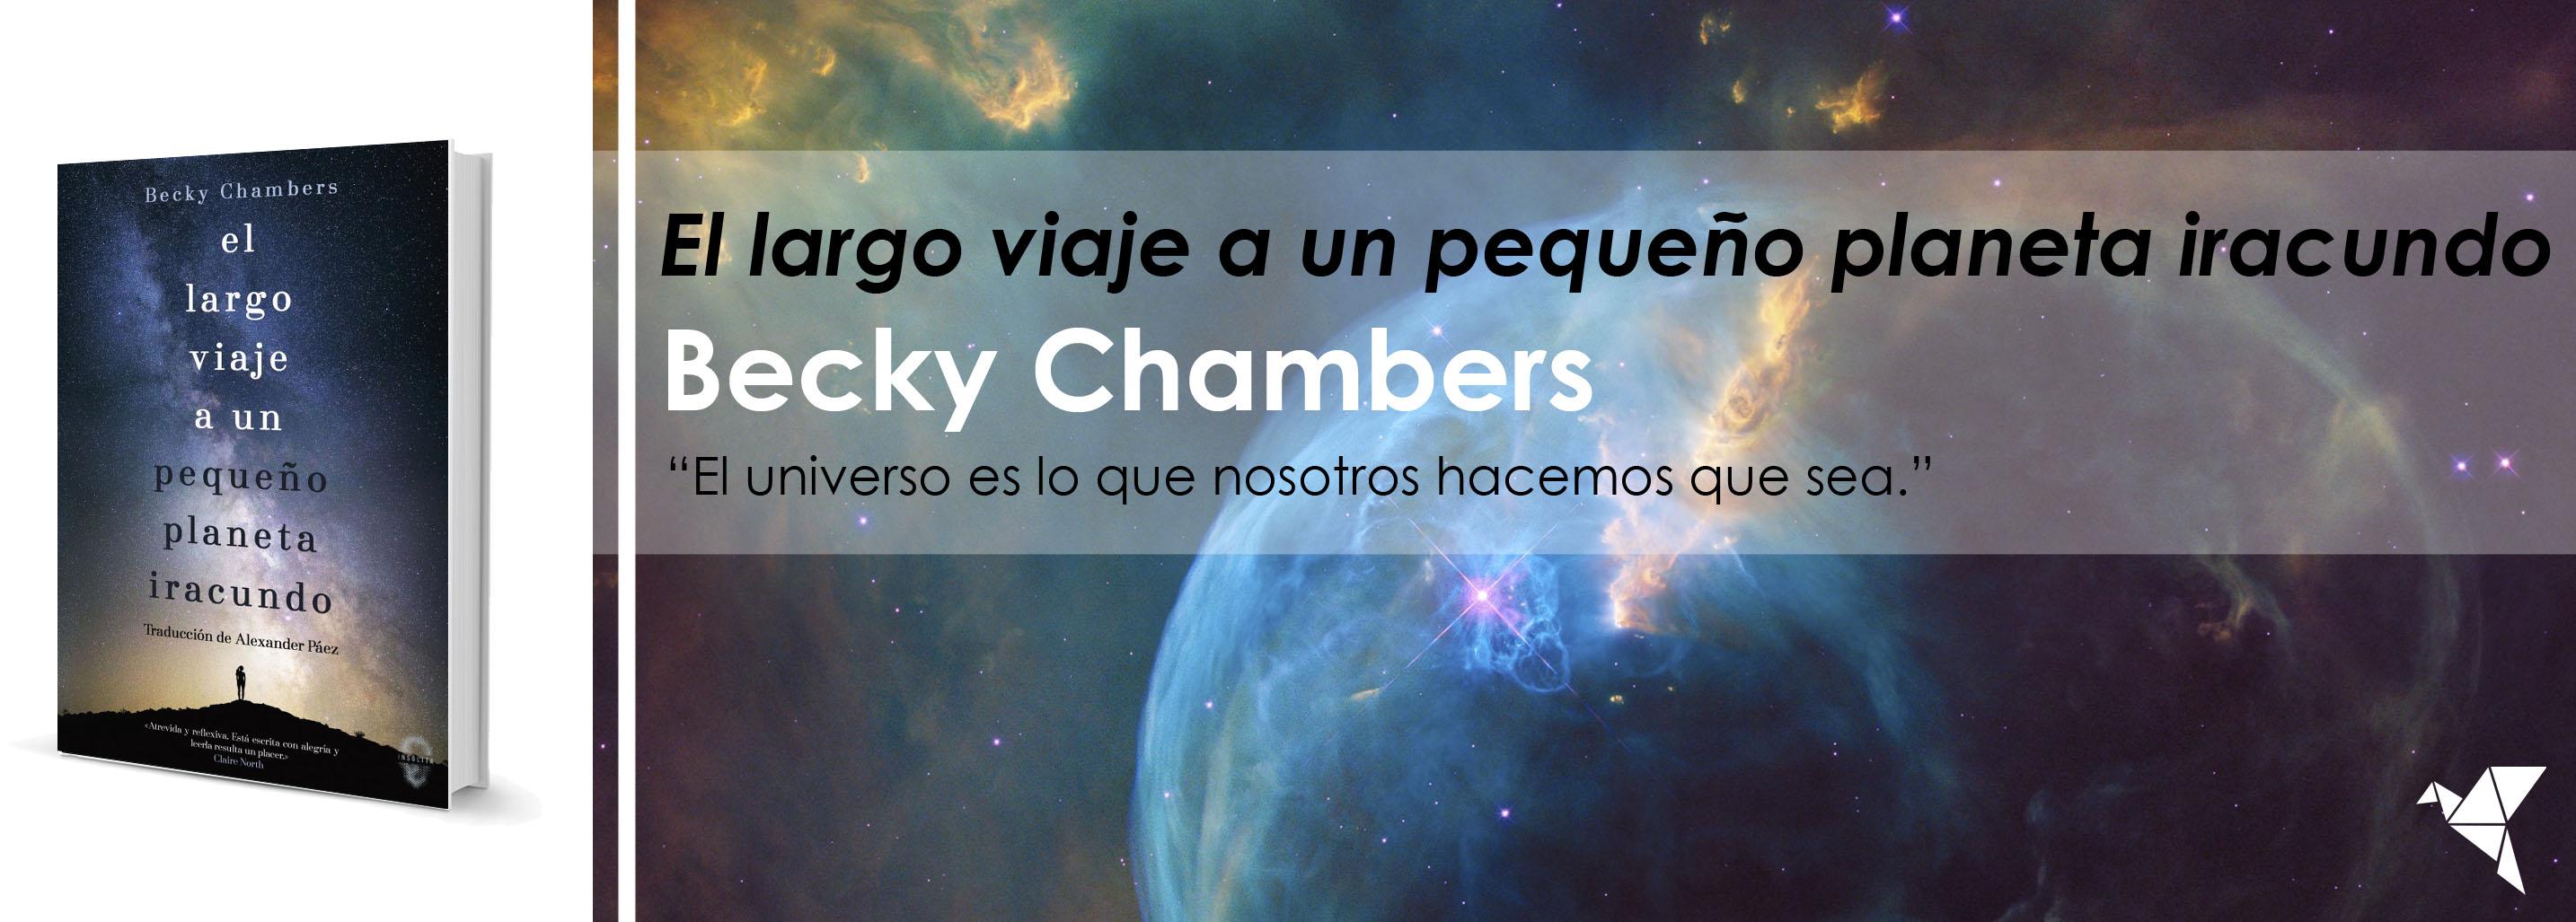 El largo viaje a un pequeño planeta iracundo, de Becky Chambers